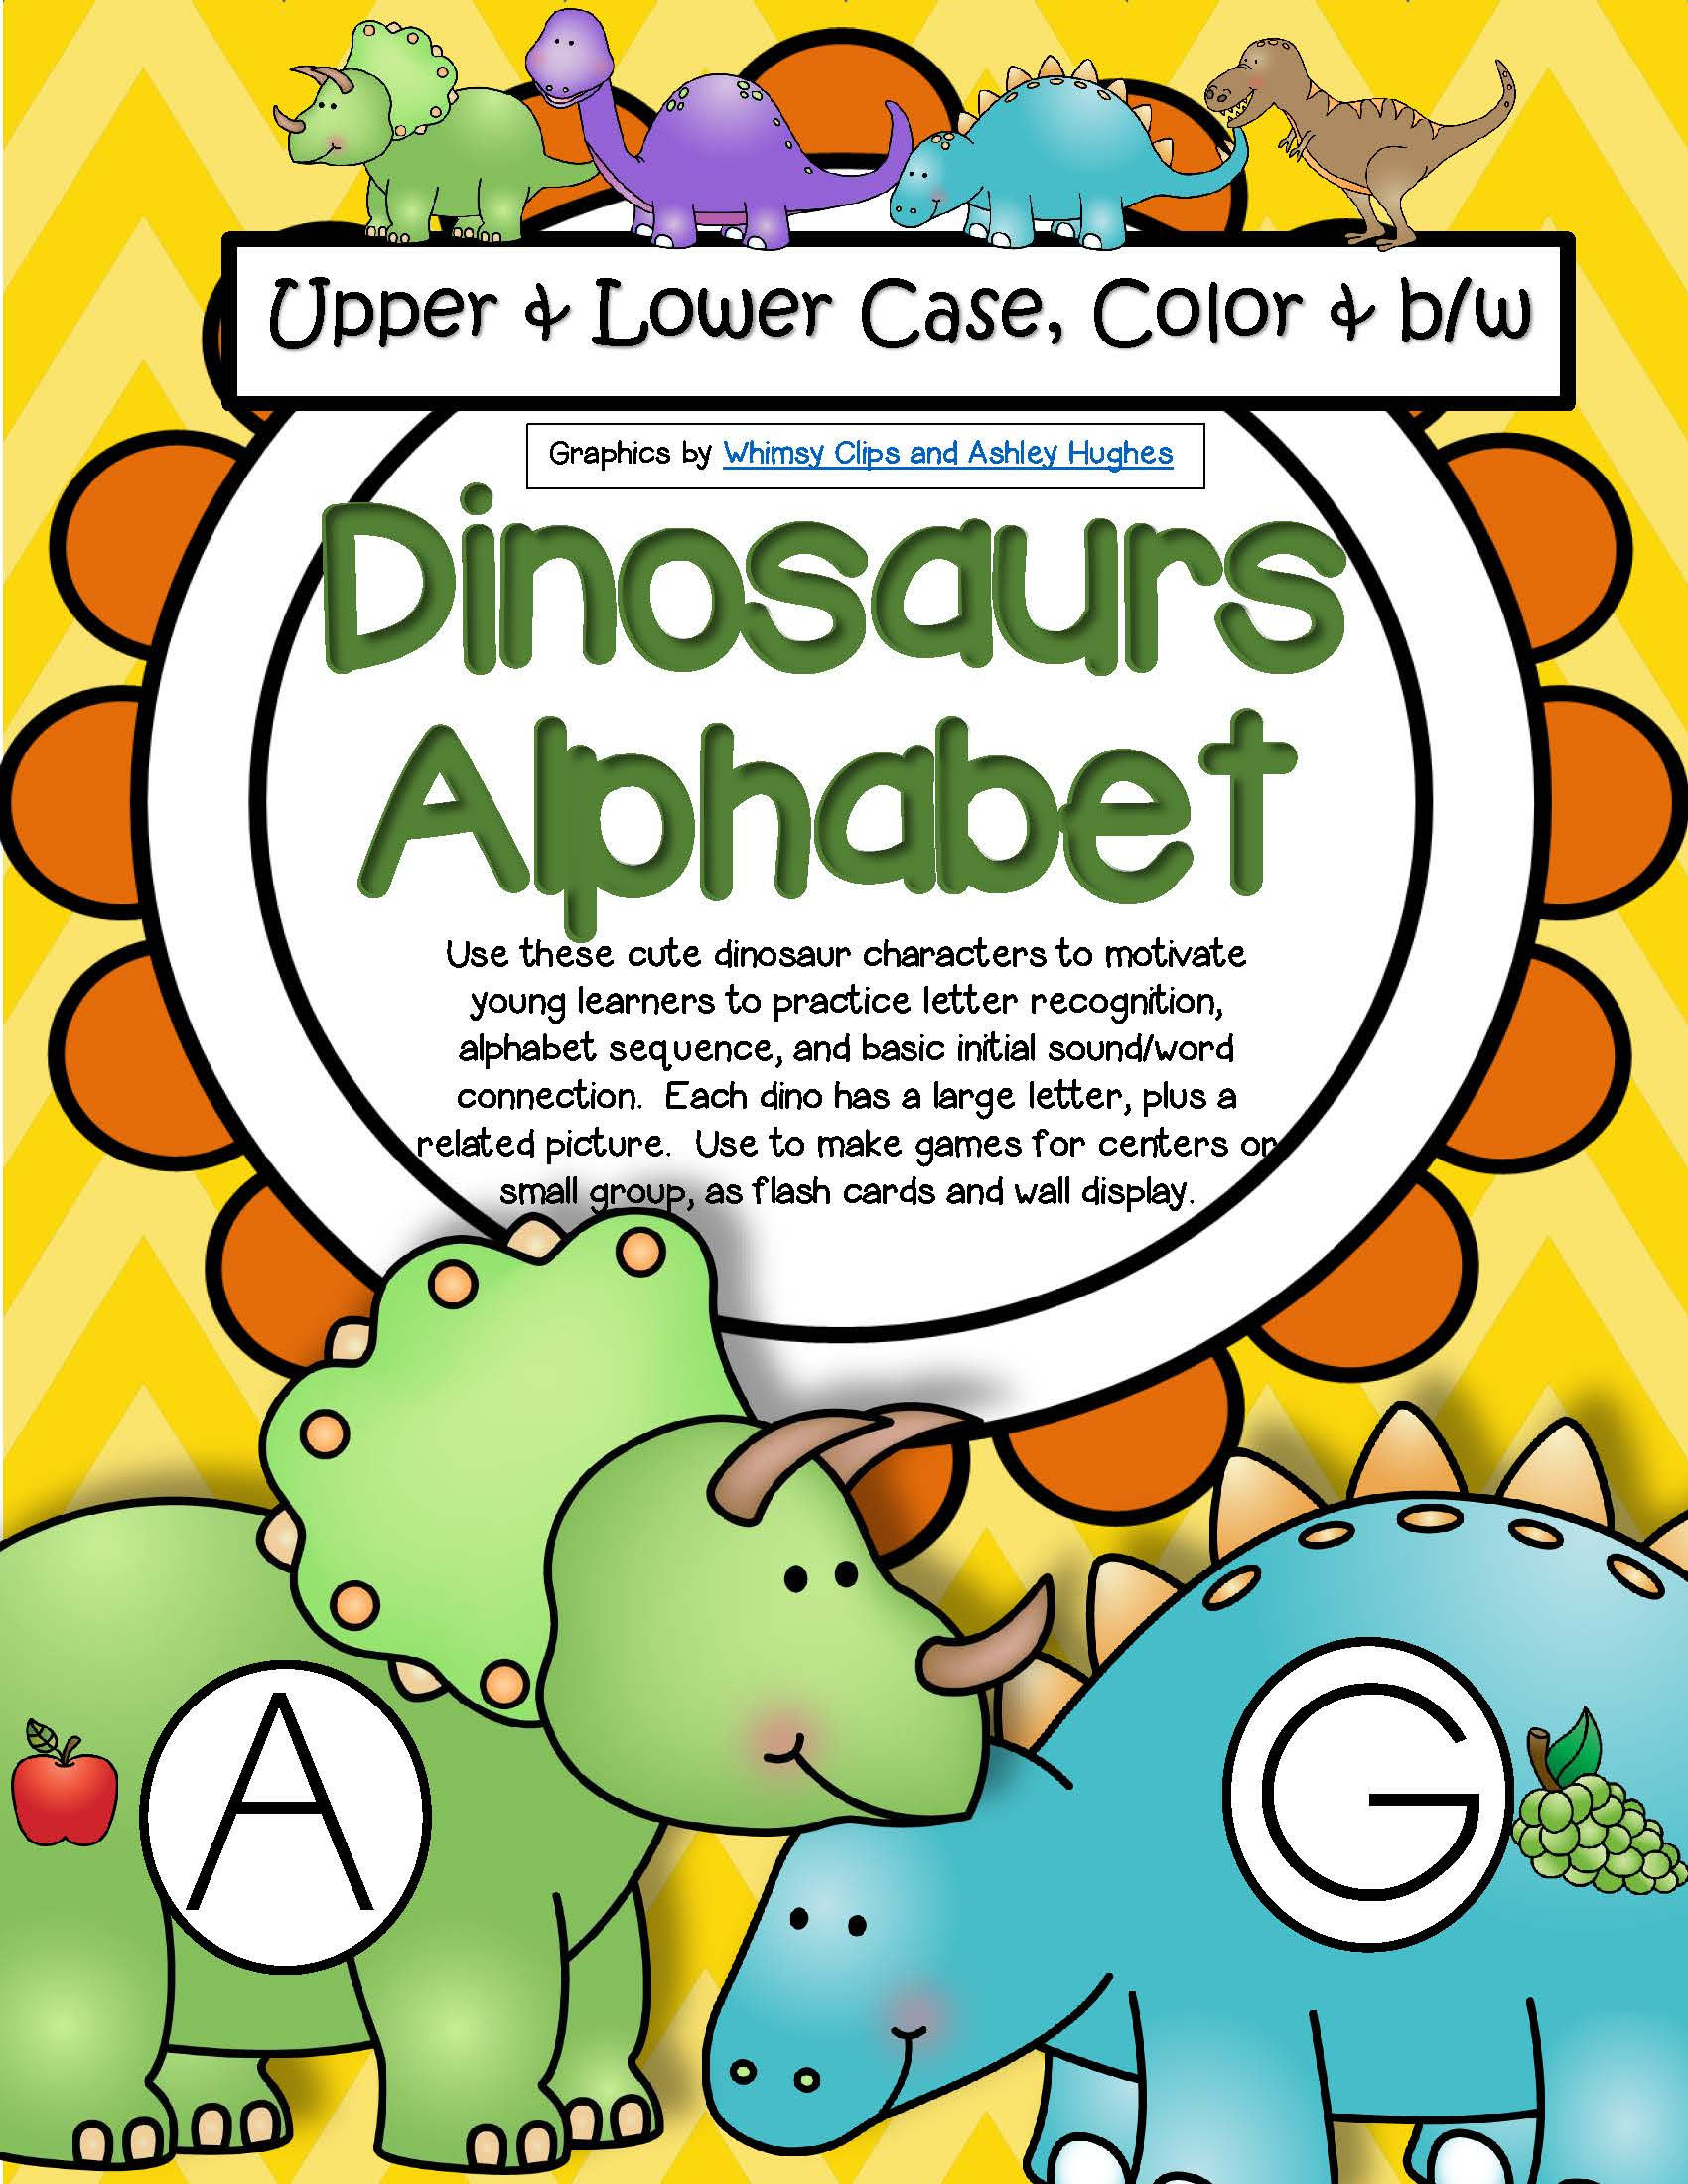 Dinosaurs Alphabet